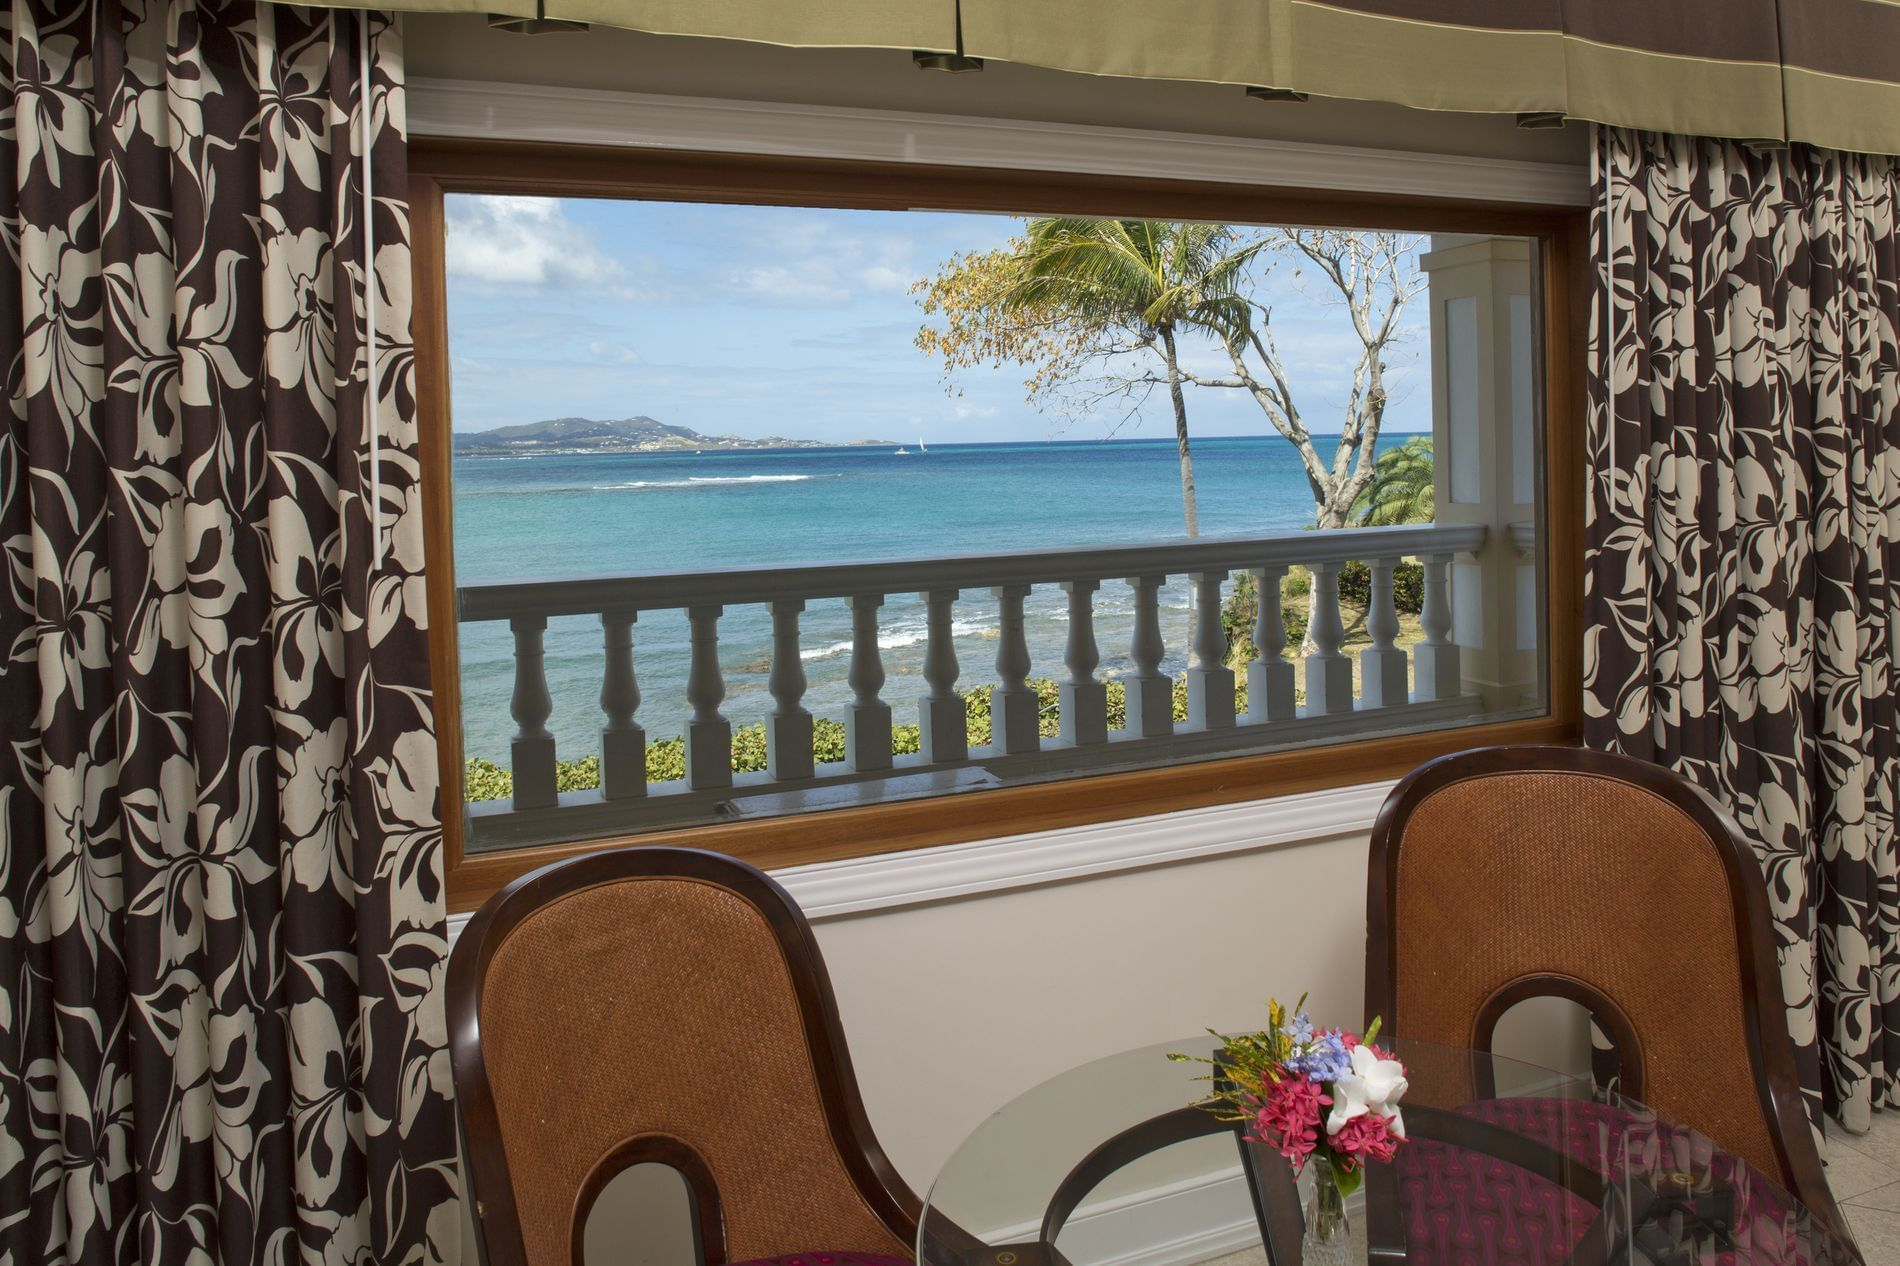 Luxury Beachside Doubloon Window showing Ocean View